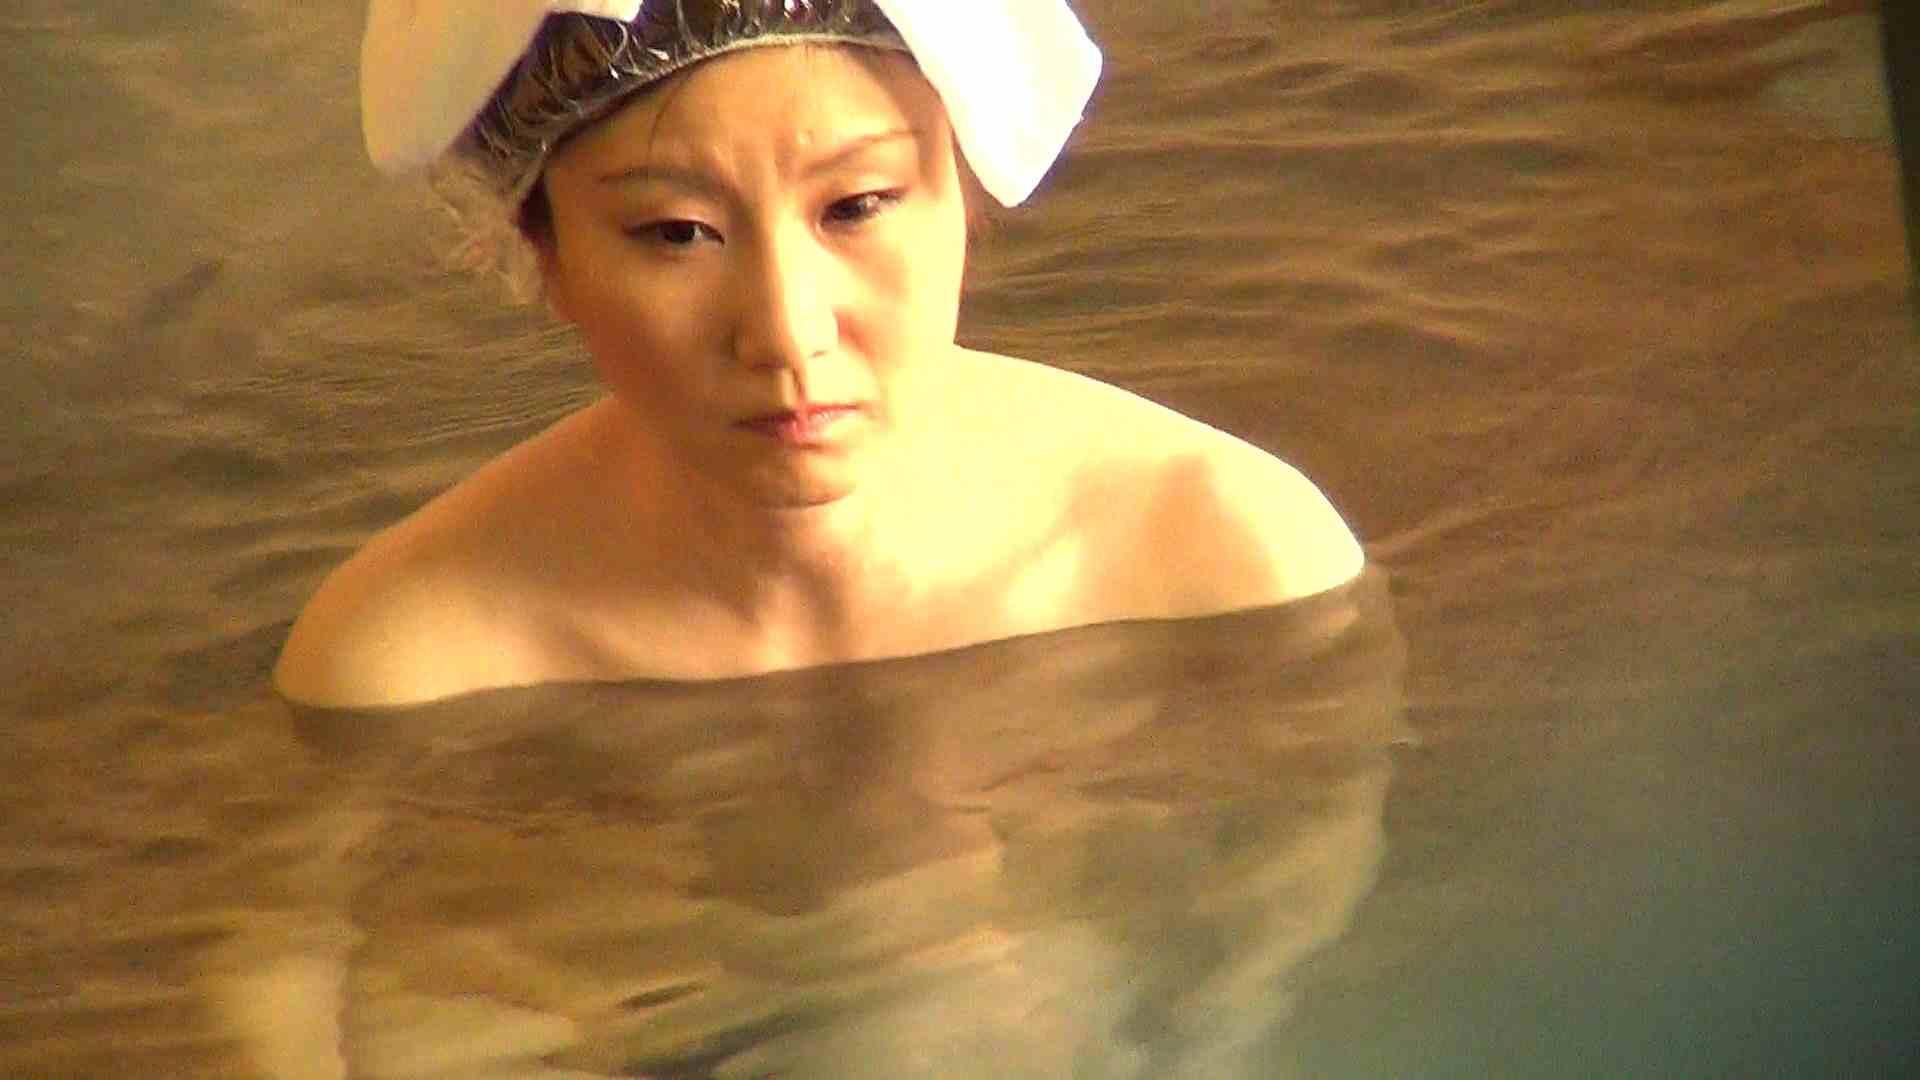 Aquaな露天風呂Vol.278 露天 エロ無料画像 88連発 54